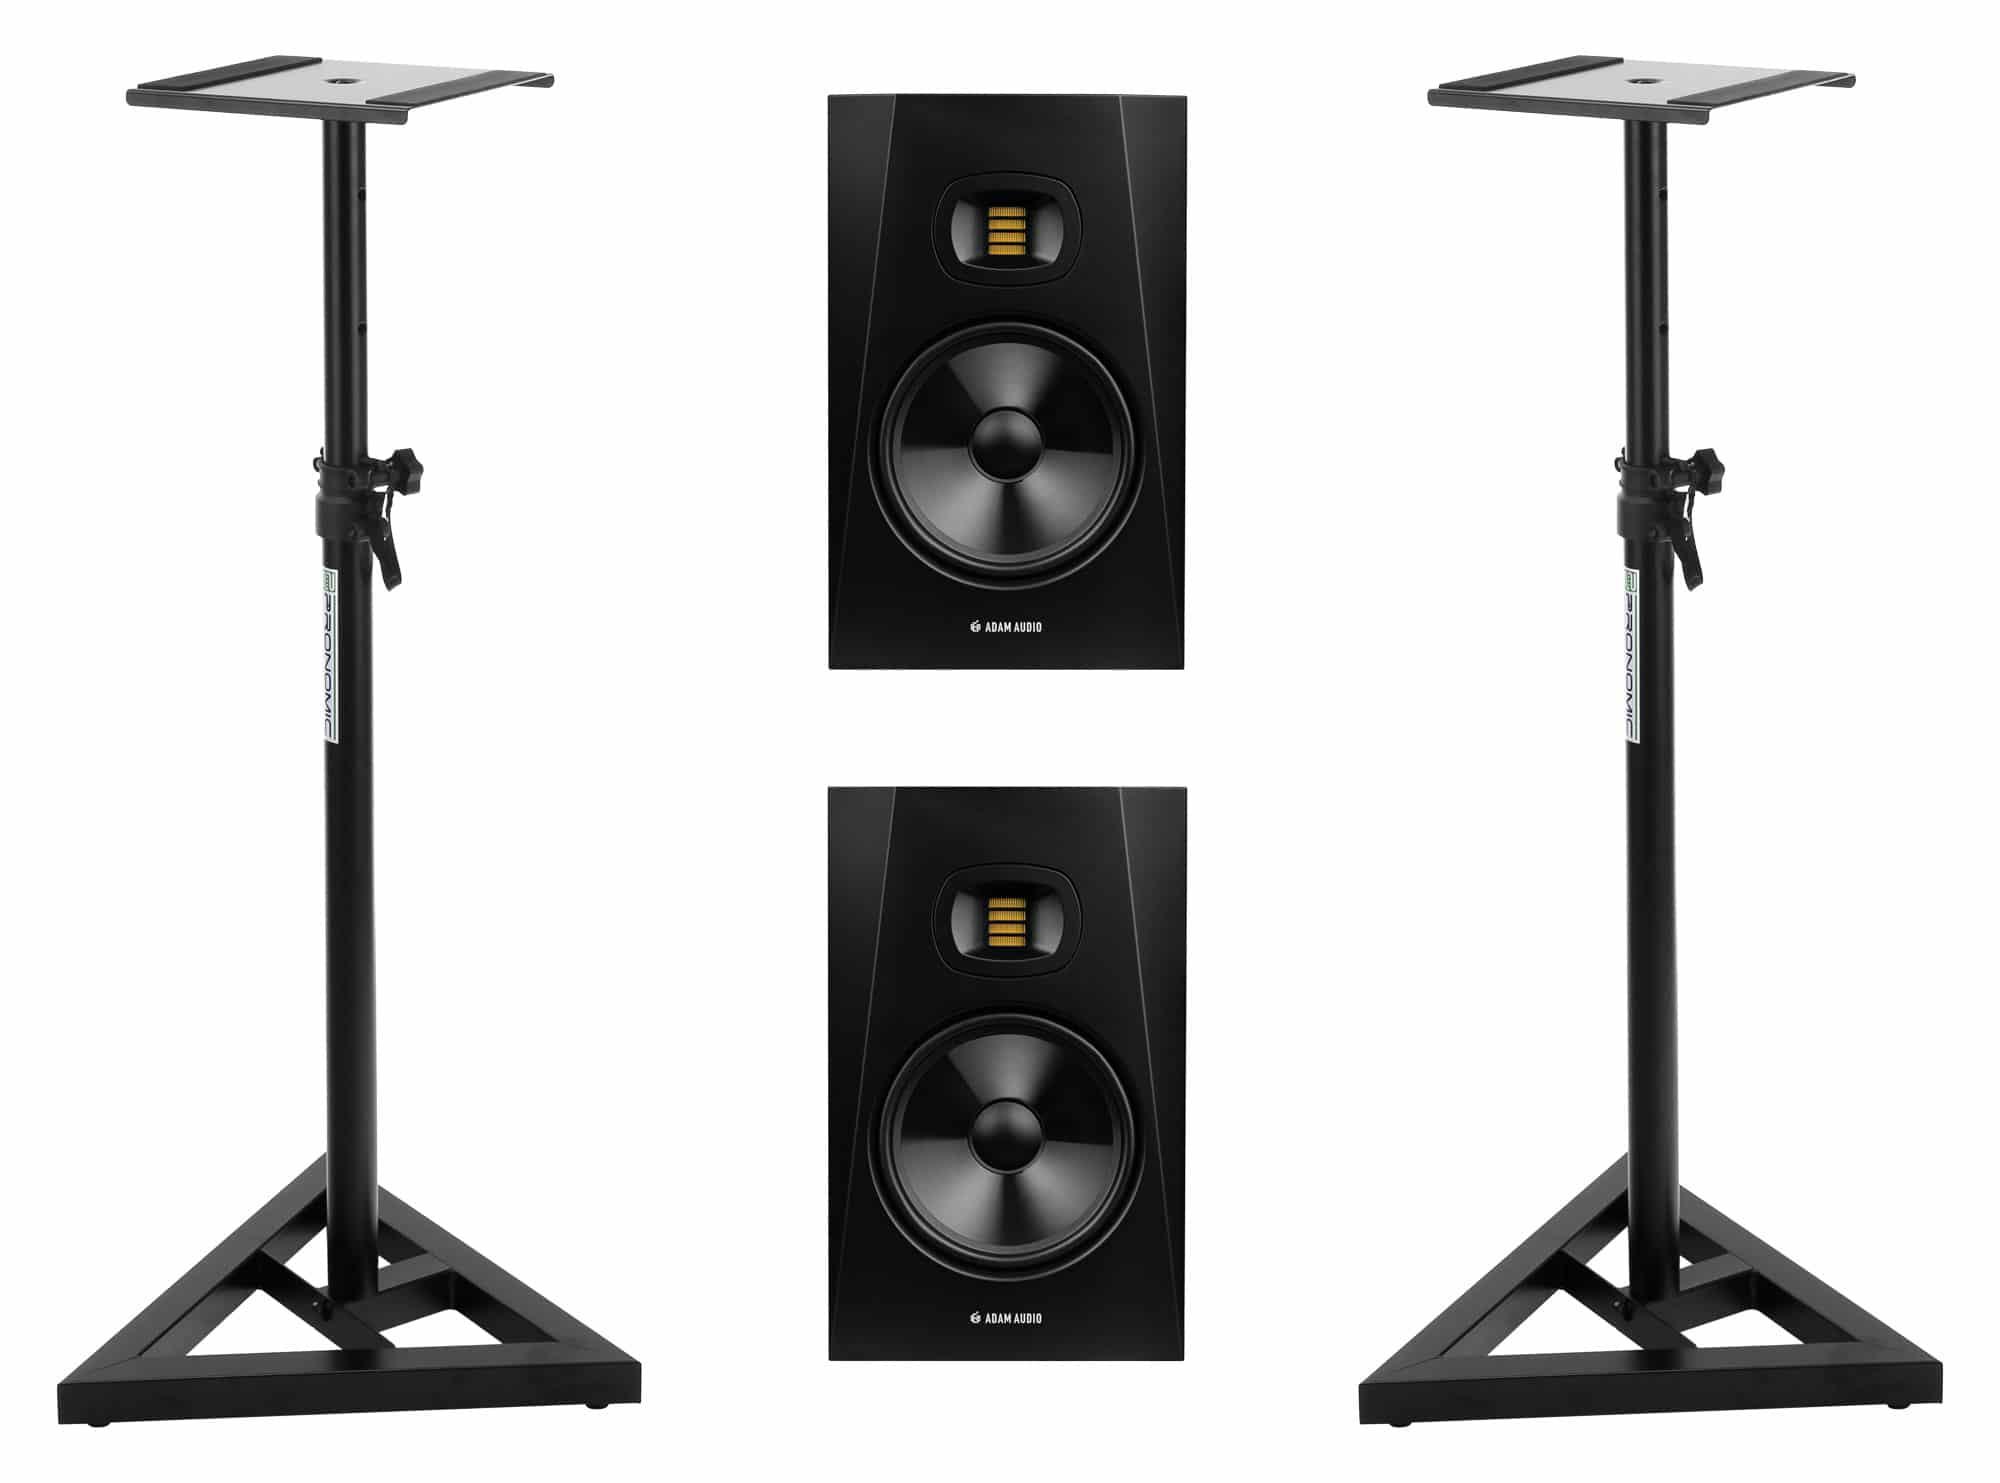 Studiomonitore - Adam Audio T8V Stativ Set - Onlineshop Musikhaus Kirstein